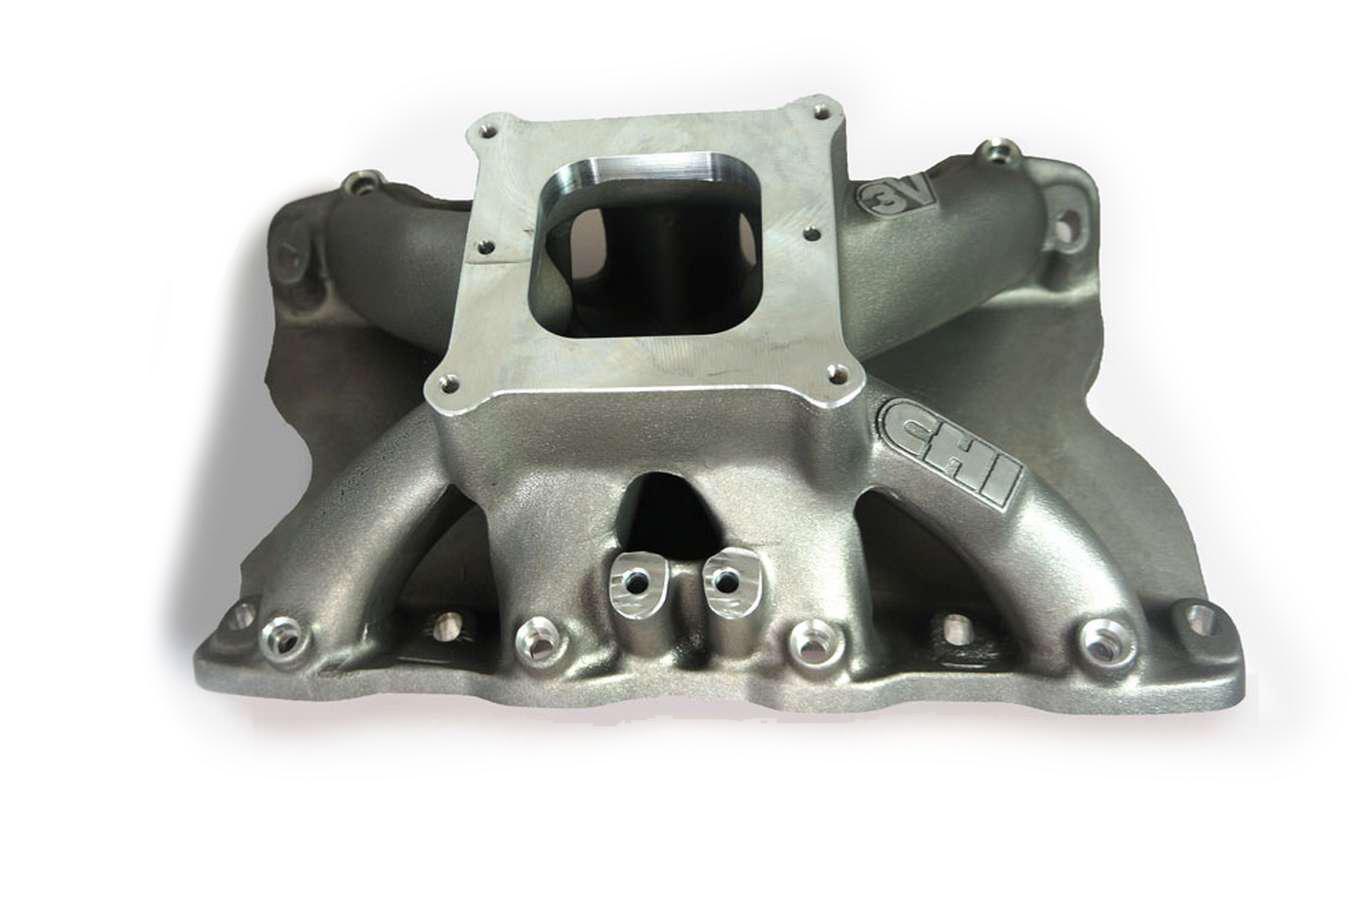 Intake Manifold - 3V 208cc Windsor 9.5